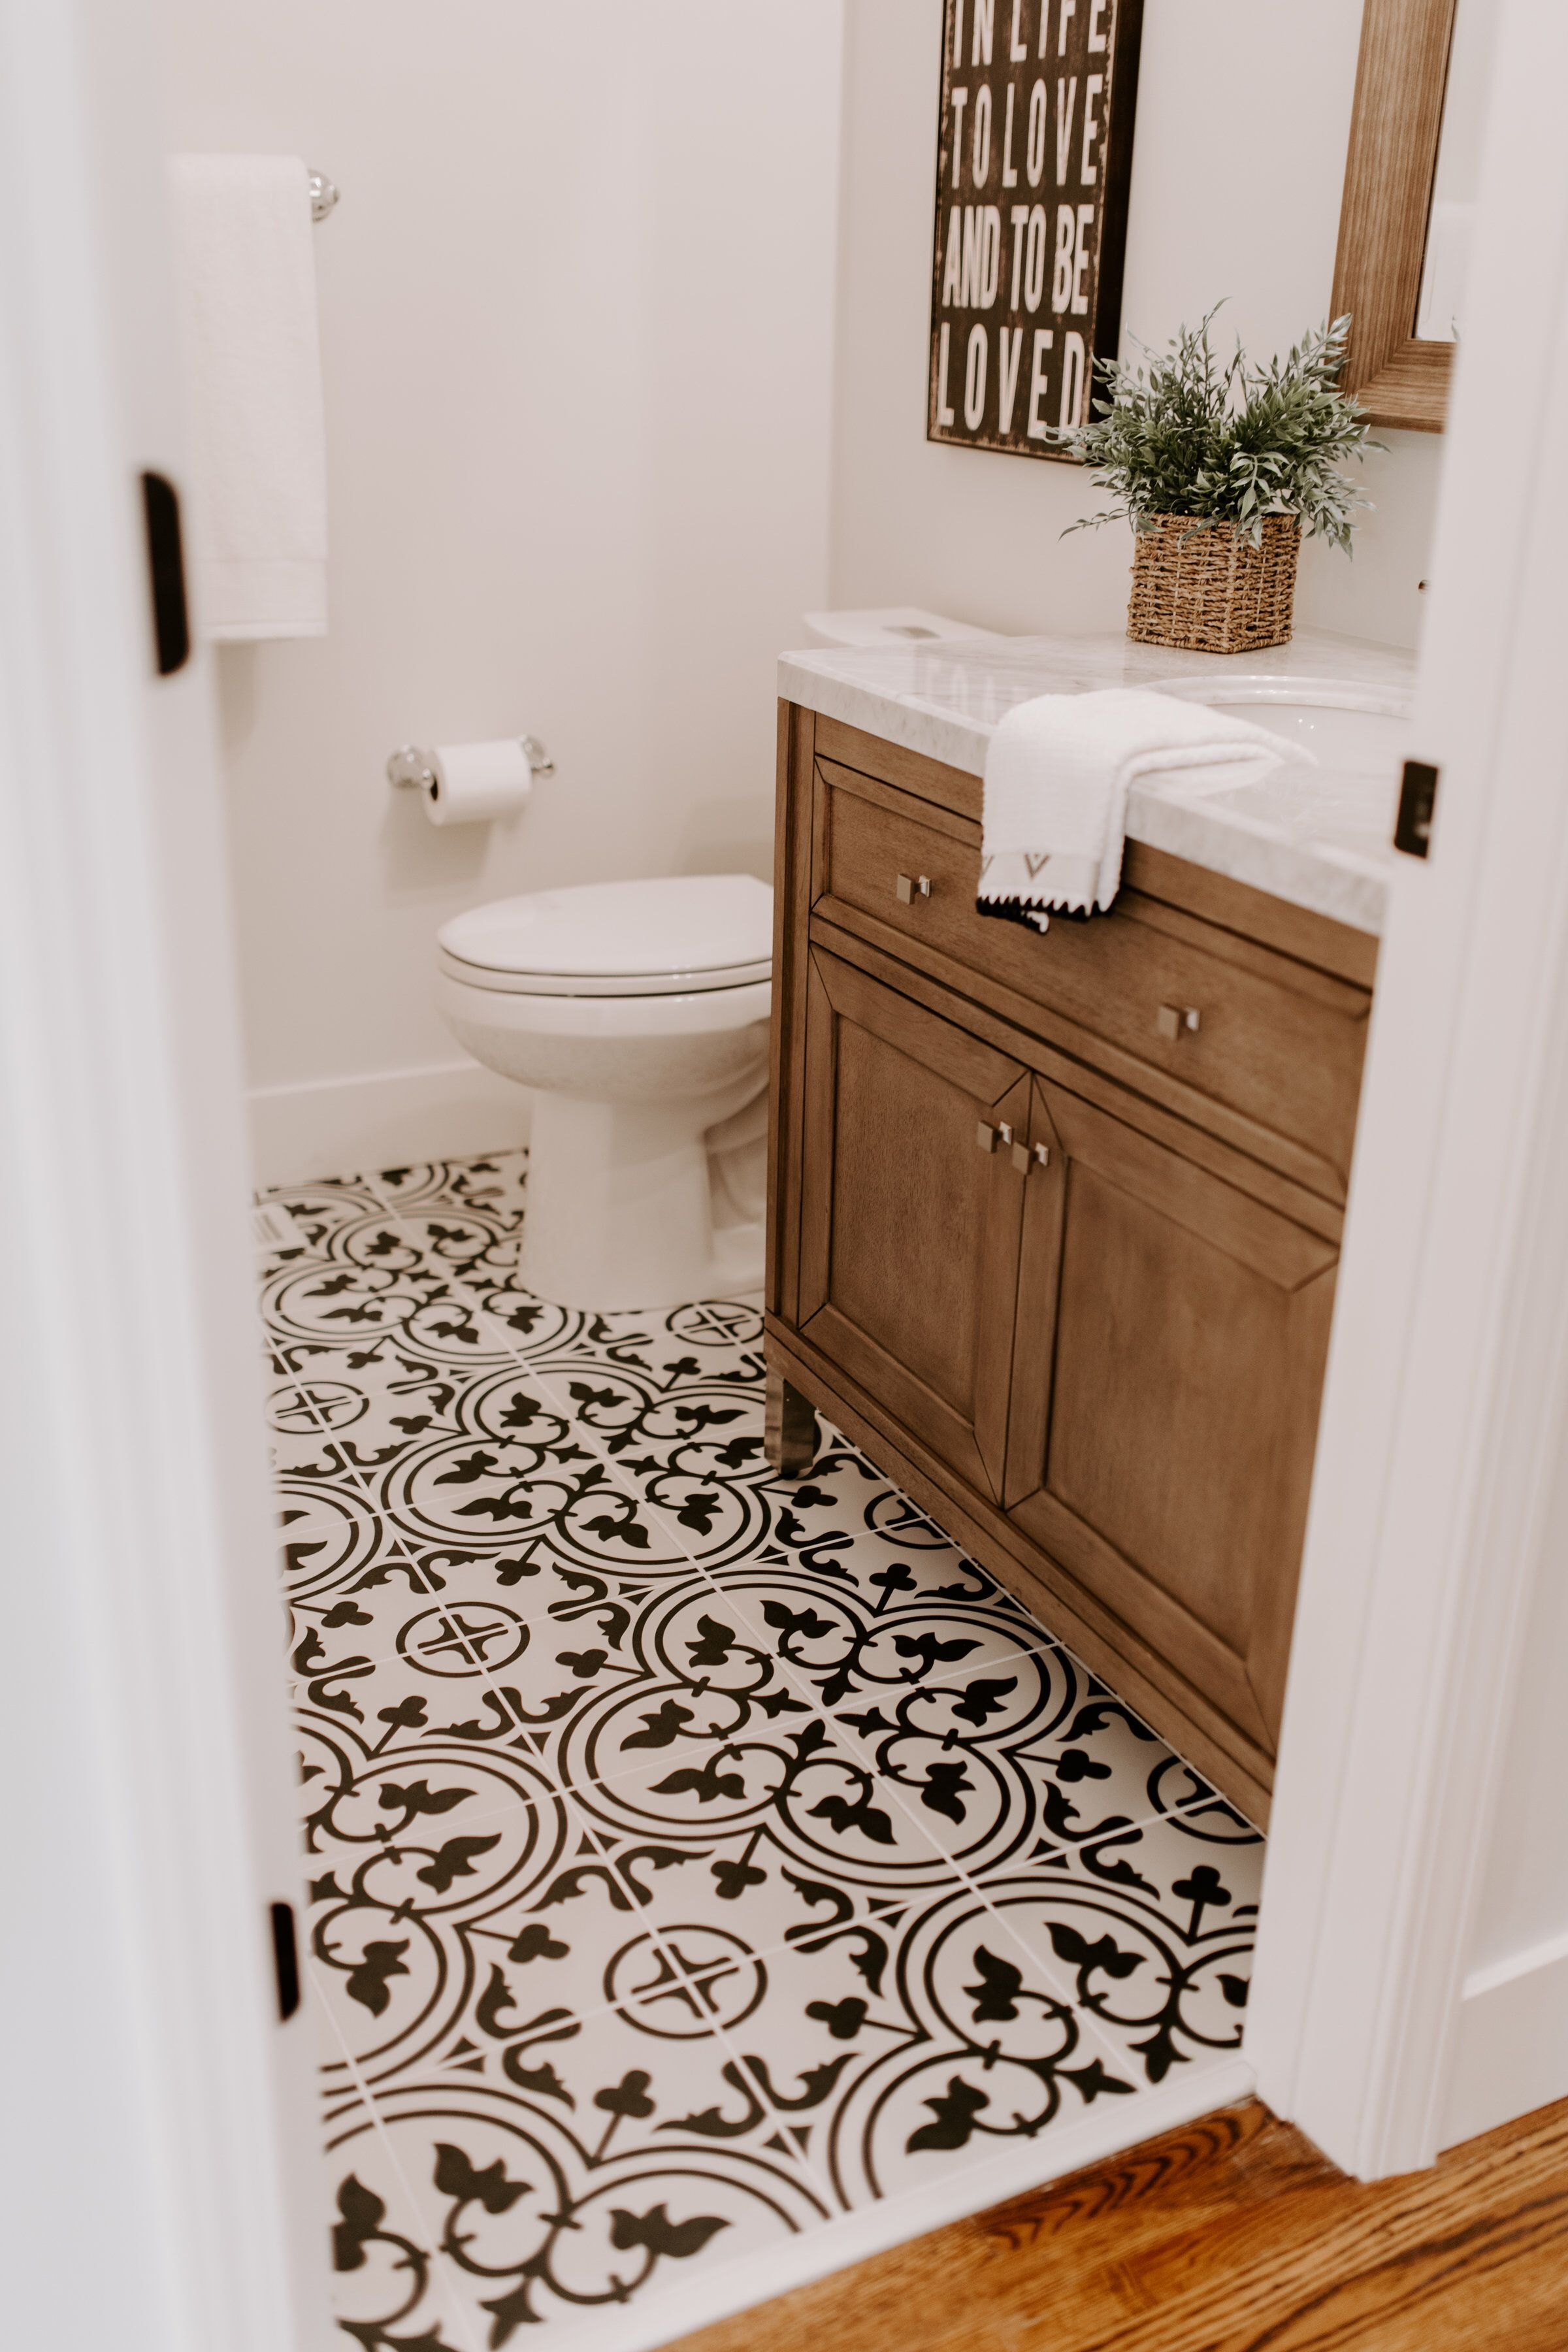 Bathroom Renovation Bathroom Style Black And White Tiles Bathrooms Remodel